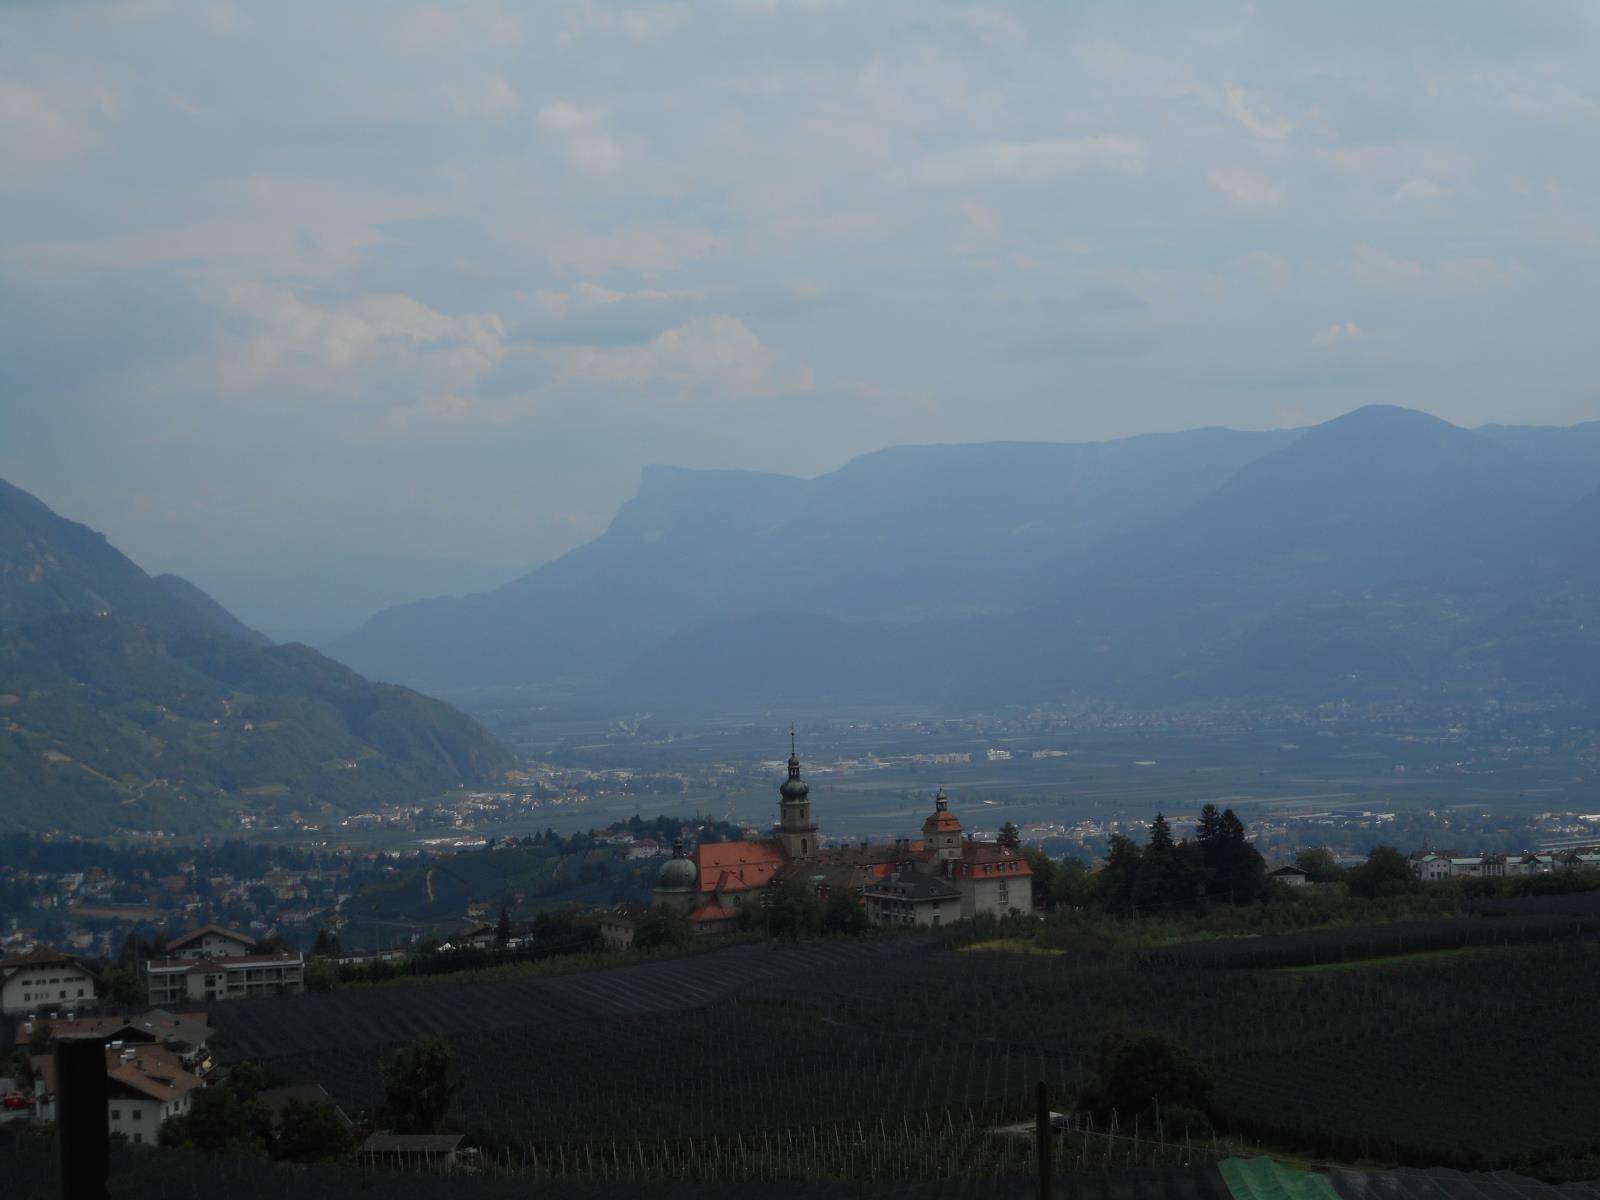 Dörf, Mérano, vallée, chaleur, monde ...